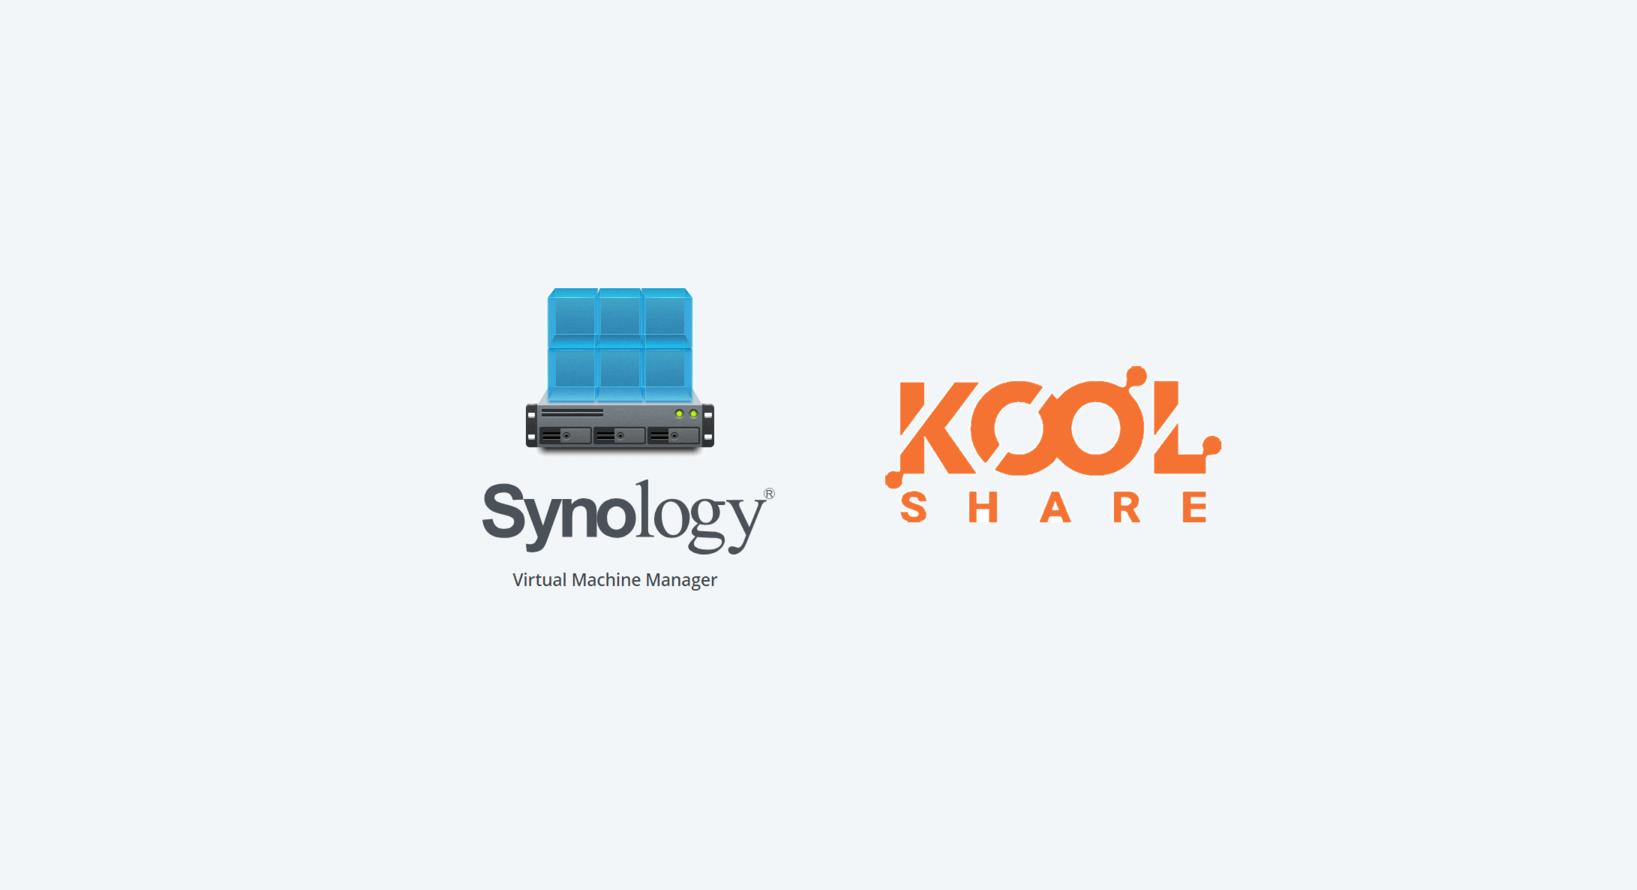 单网口群晖使用 Virtual Machine Manager 安装 Koolshare OpenWRT 作为旁路网关